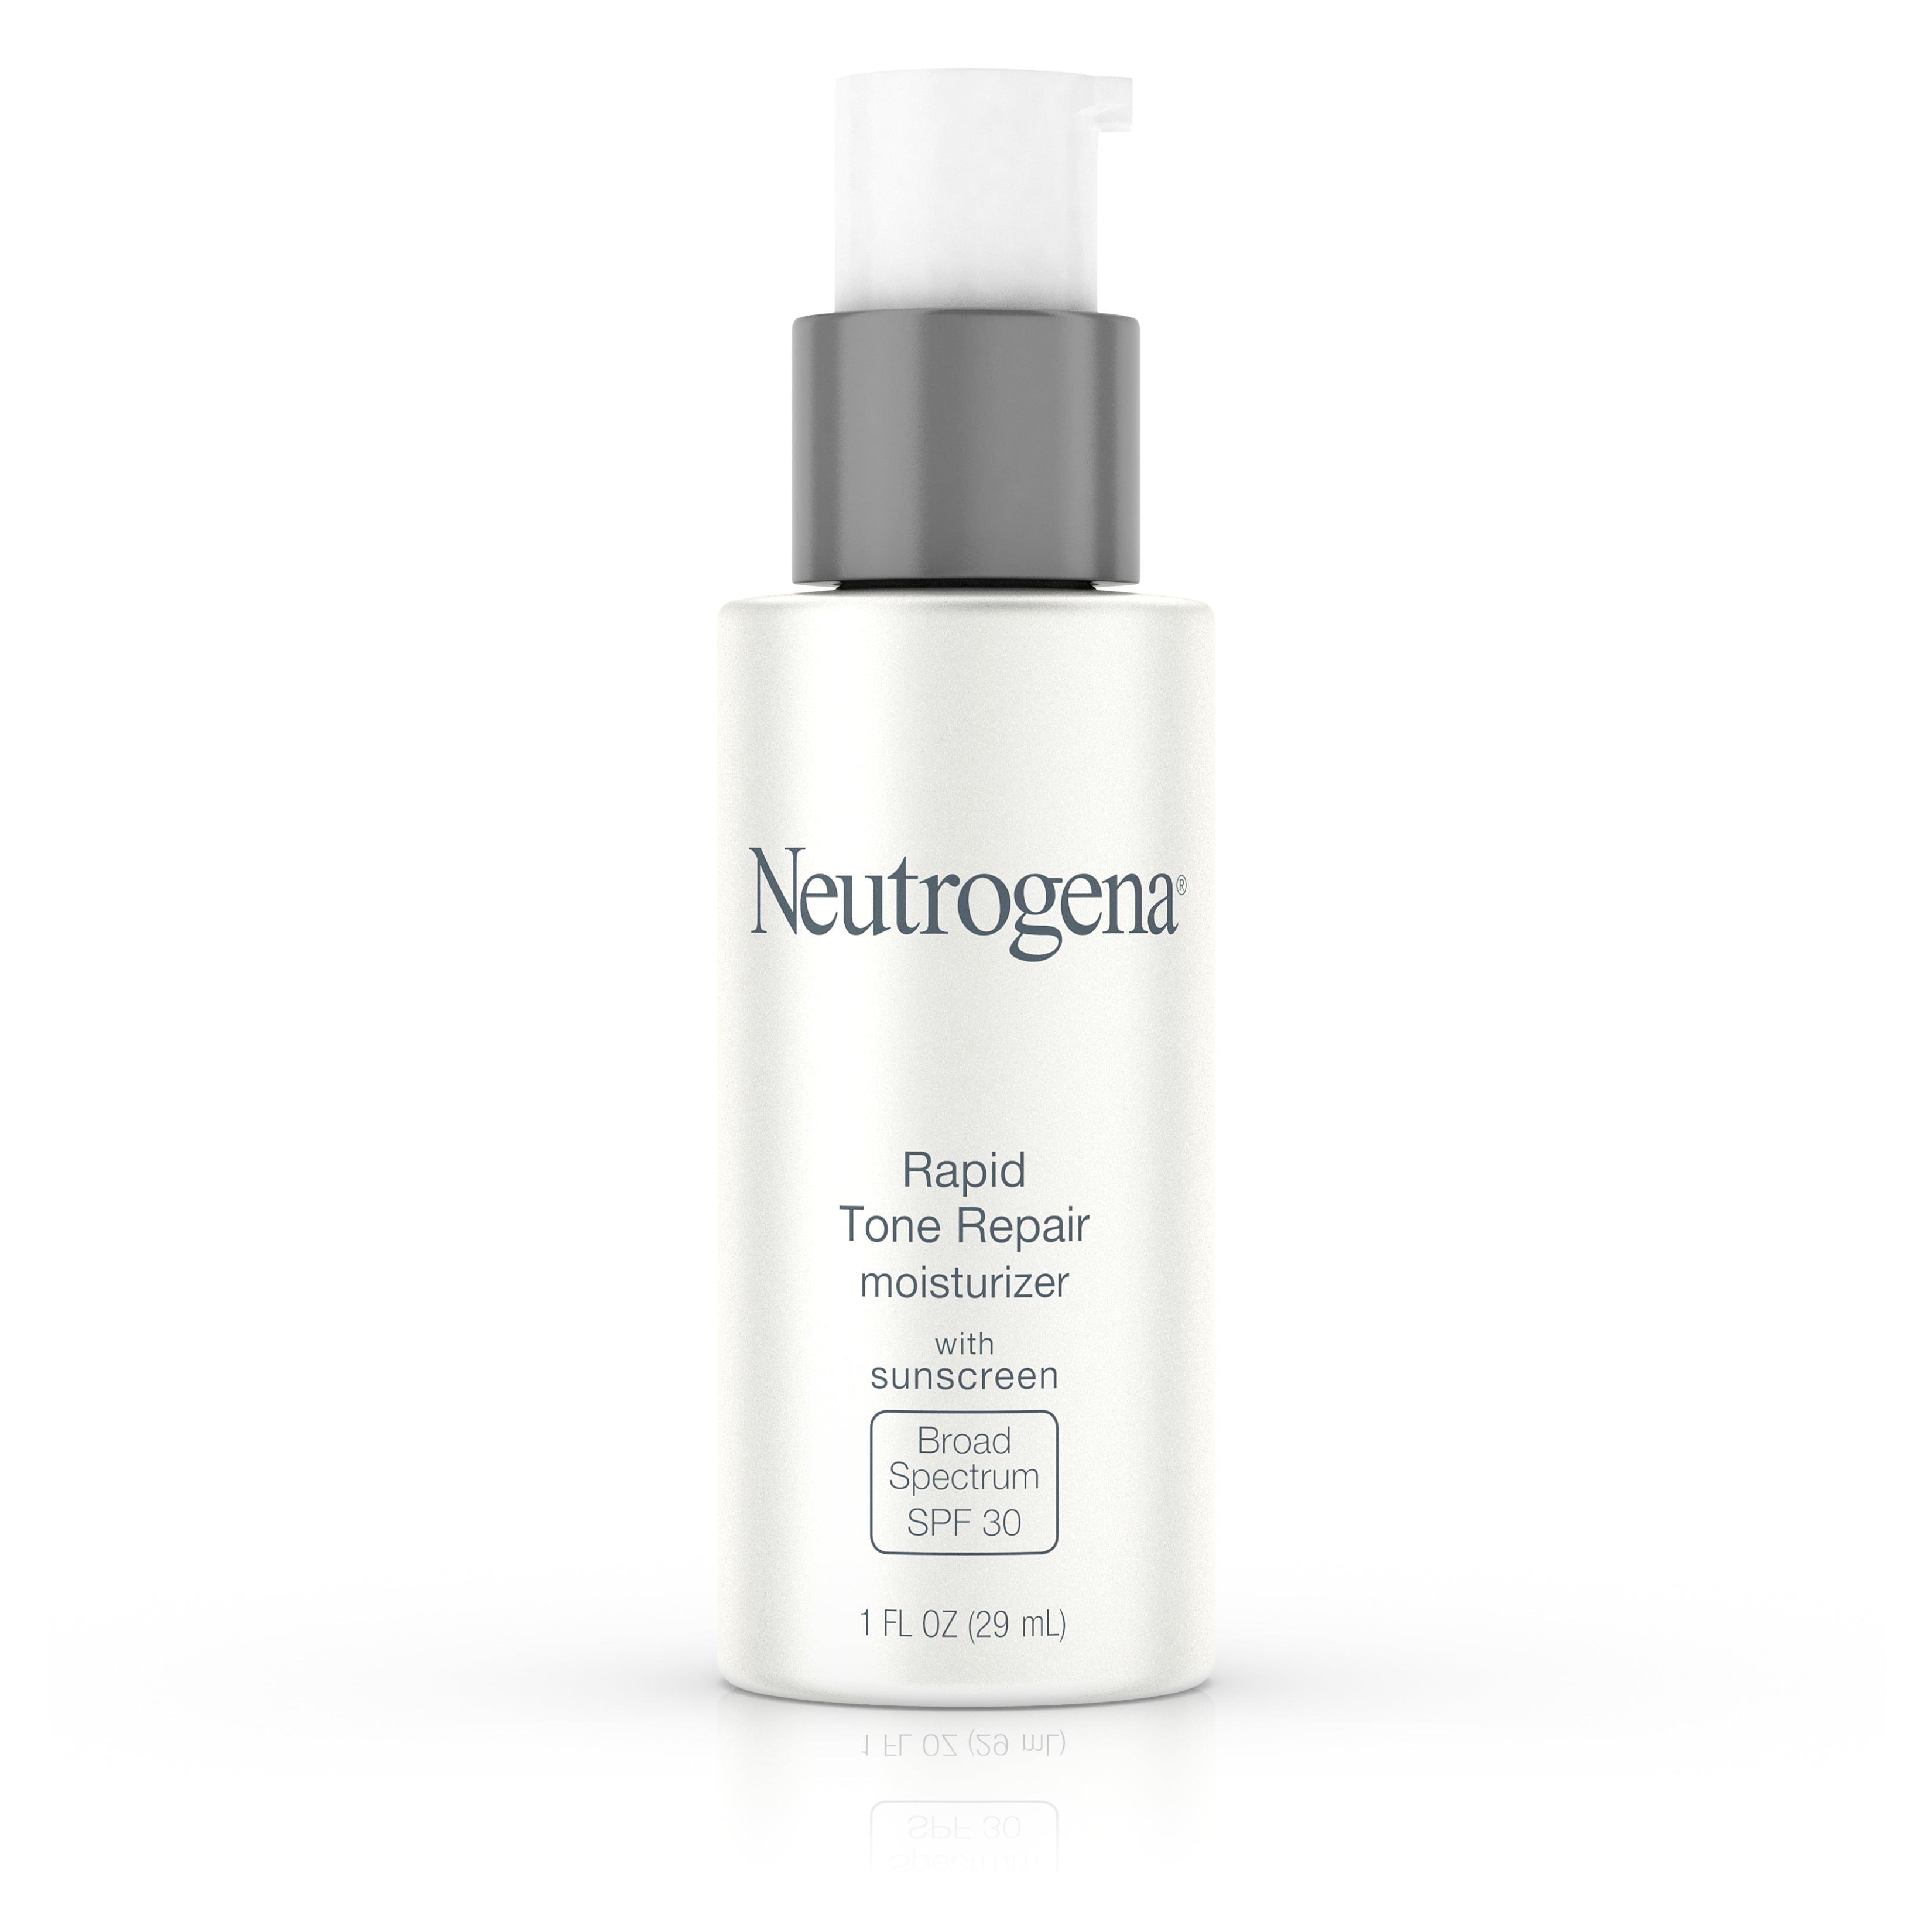 Neutrogena Rapid Tone Retinol  Vitamin C Moisturizer - SPF 30 - 1 fl oz